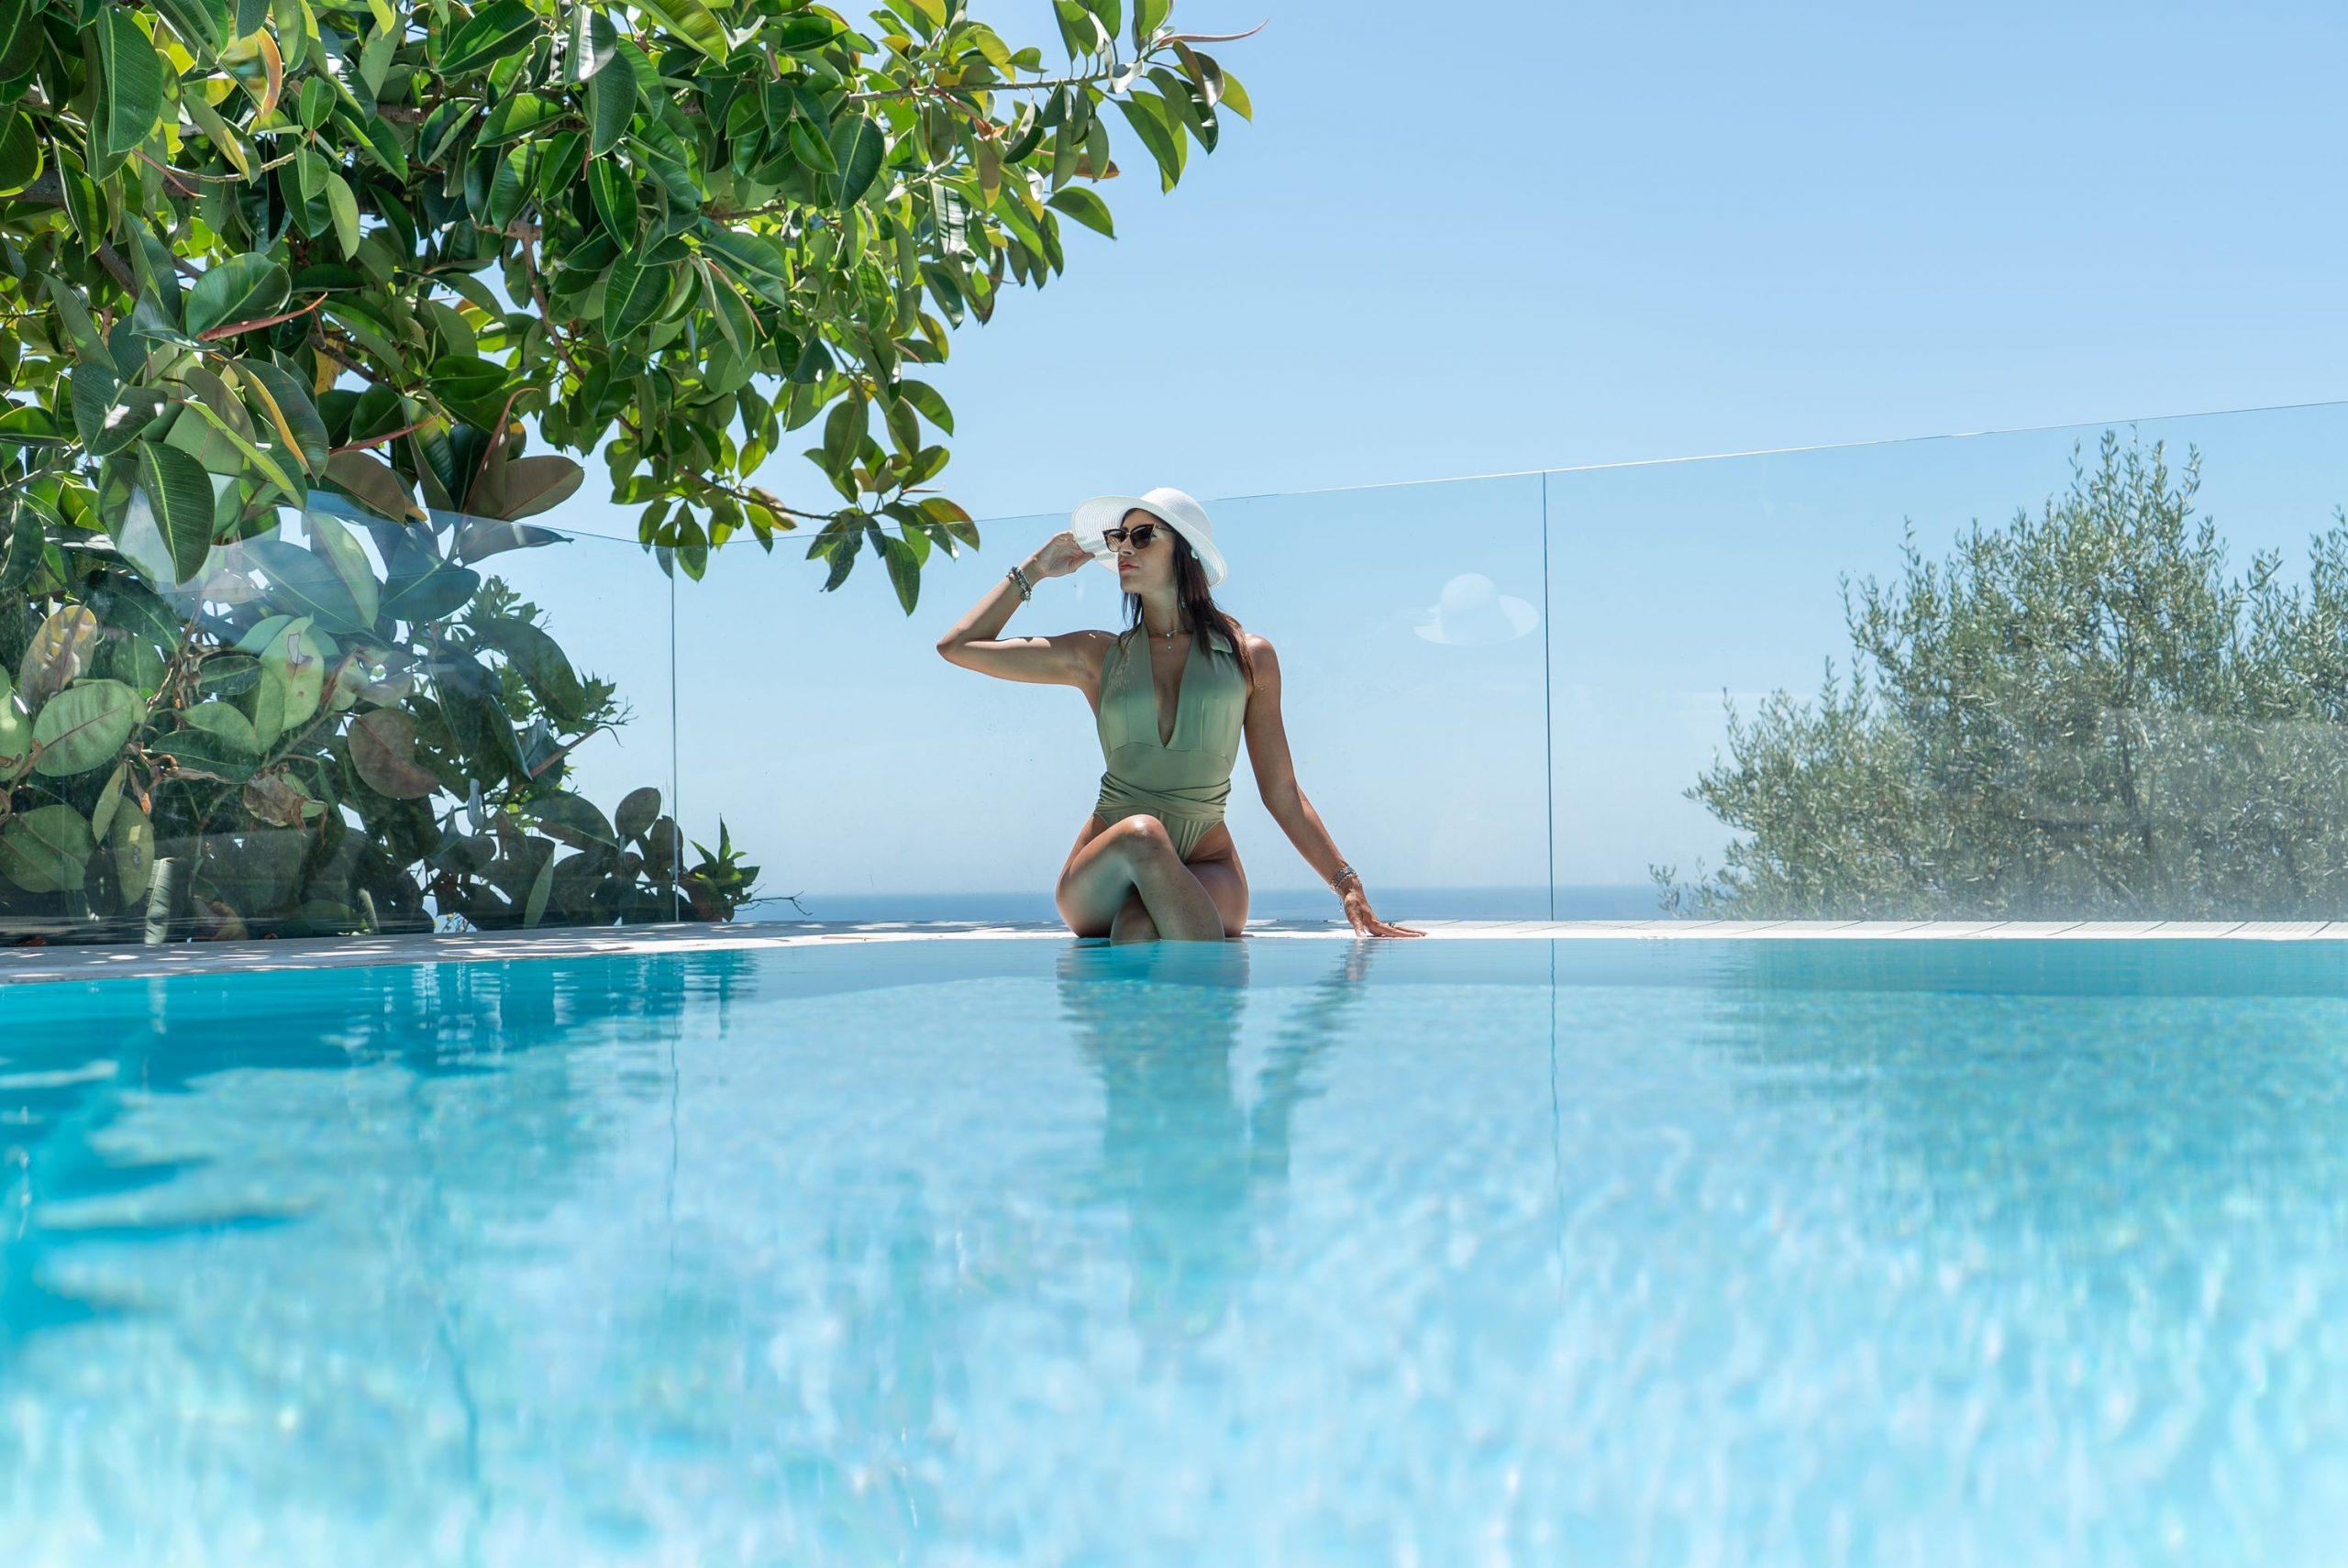 Villa Sorrento Coast with swimming pool and sea view